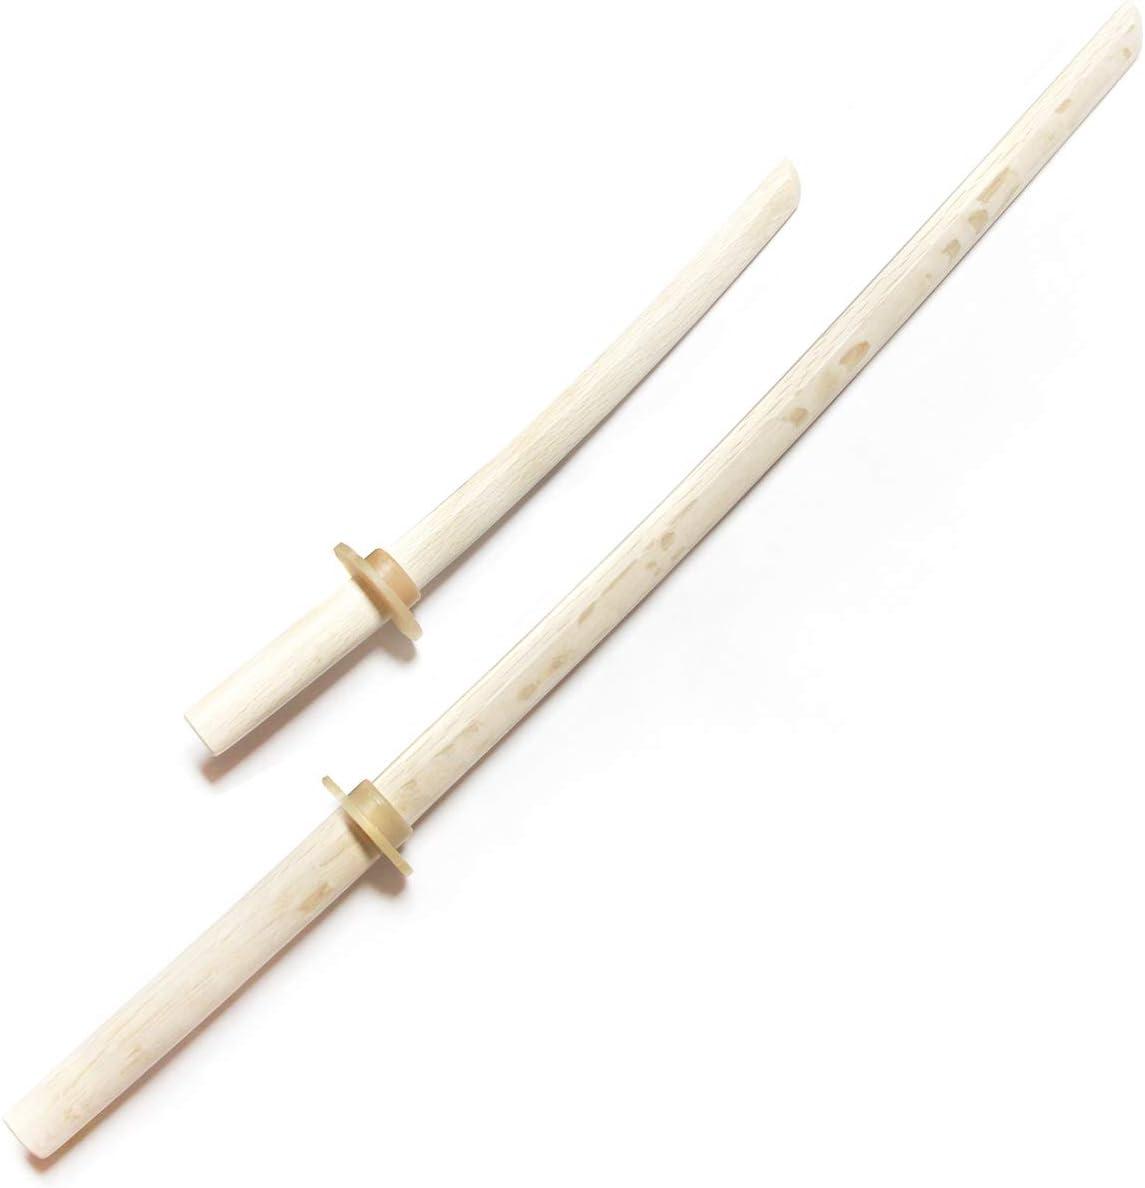 mit Tsuba massiv Miscellaneous Katana Trainings-Schwert aus Holz ausgewogen